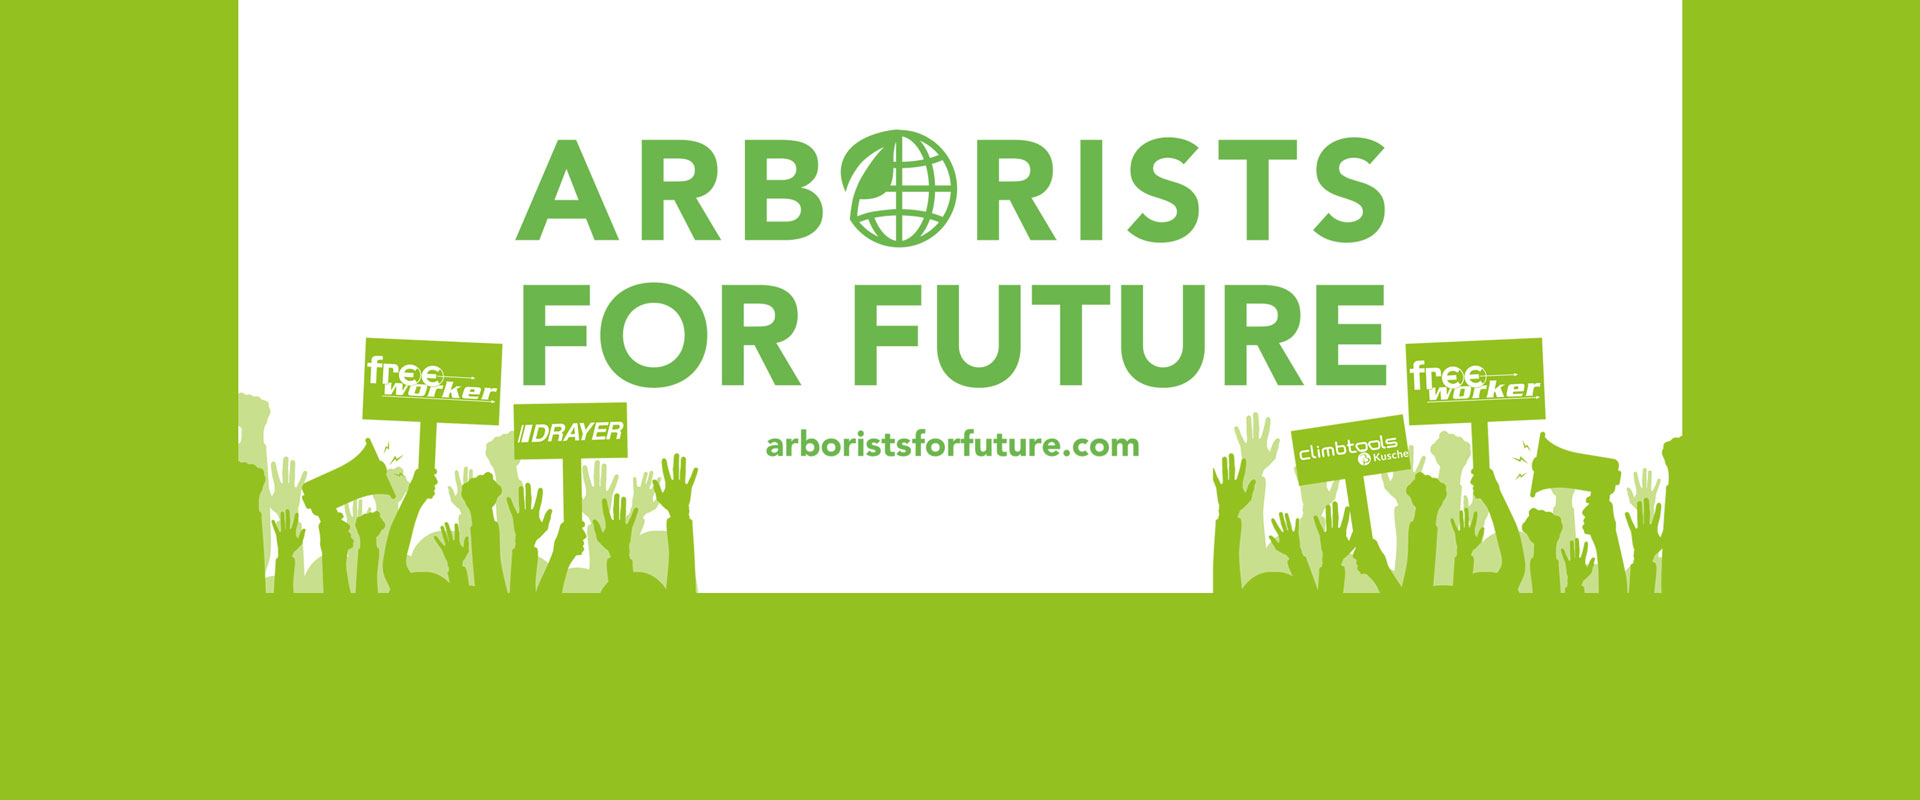 Permalink zu:#ArboristsforFuture